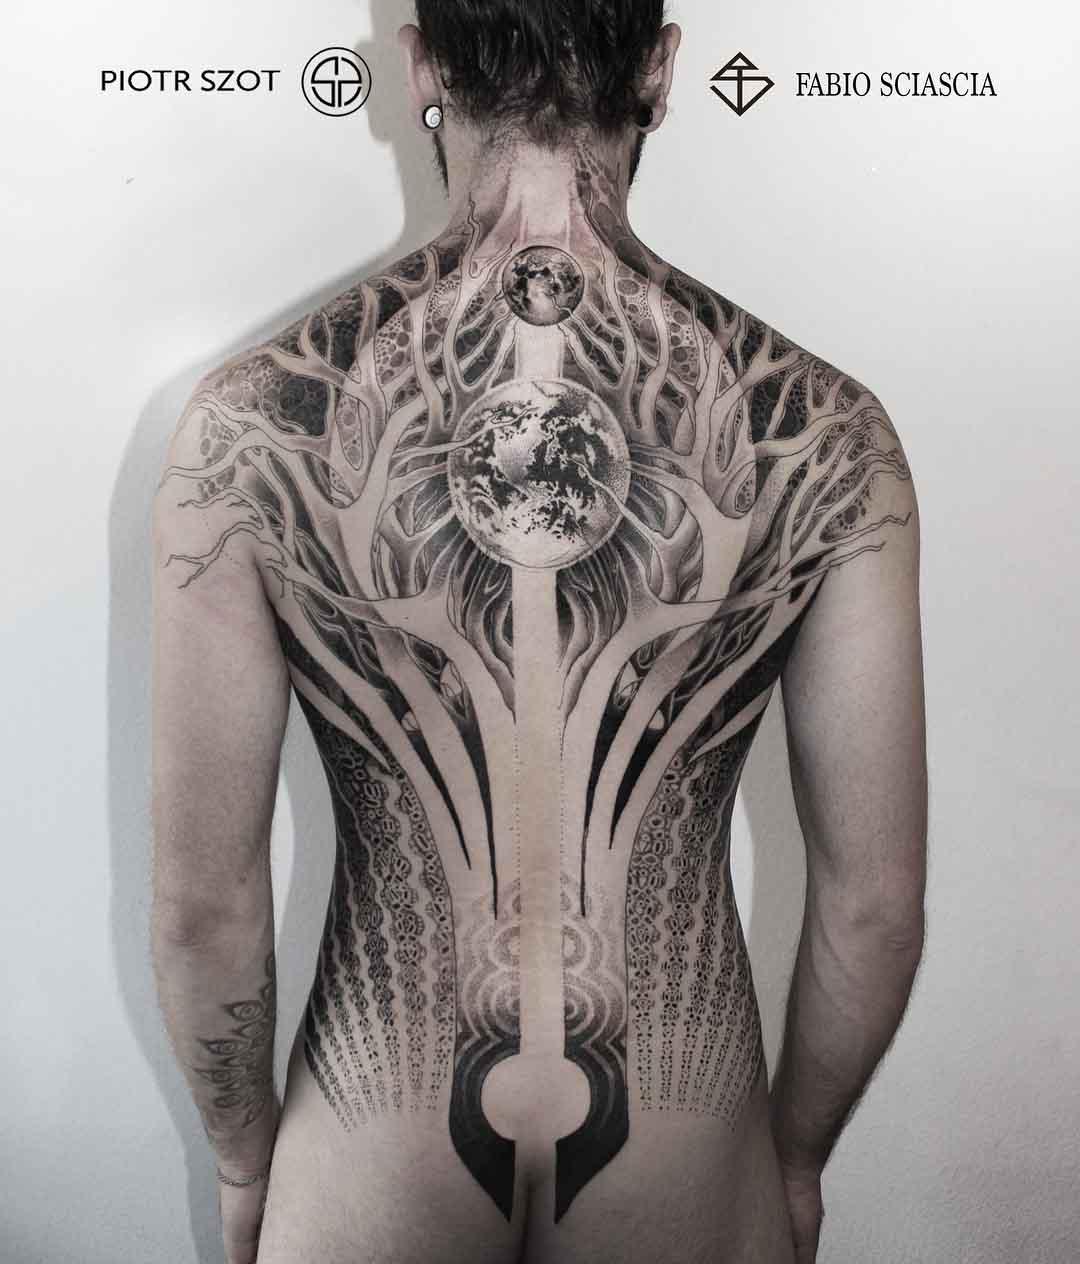 back tattoo of a world tree